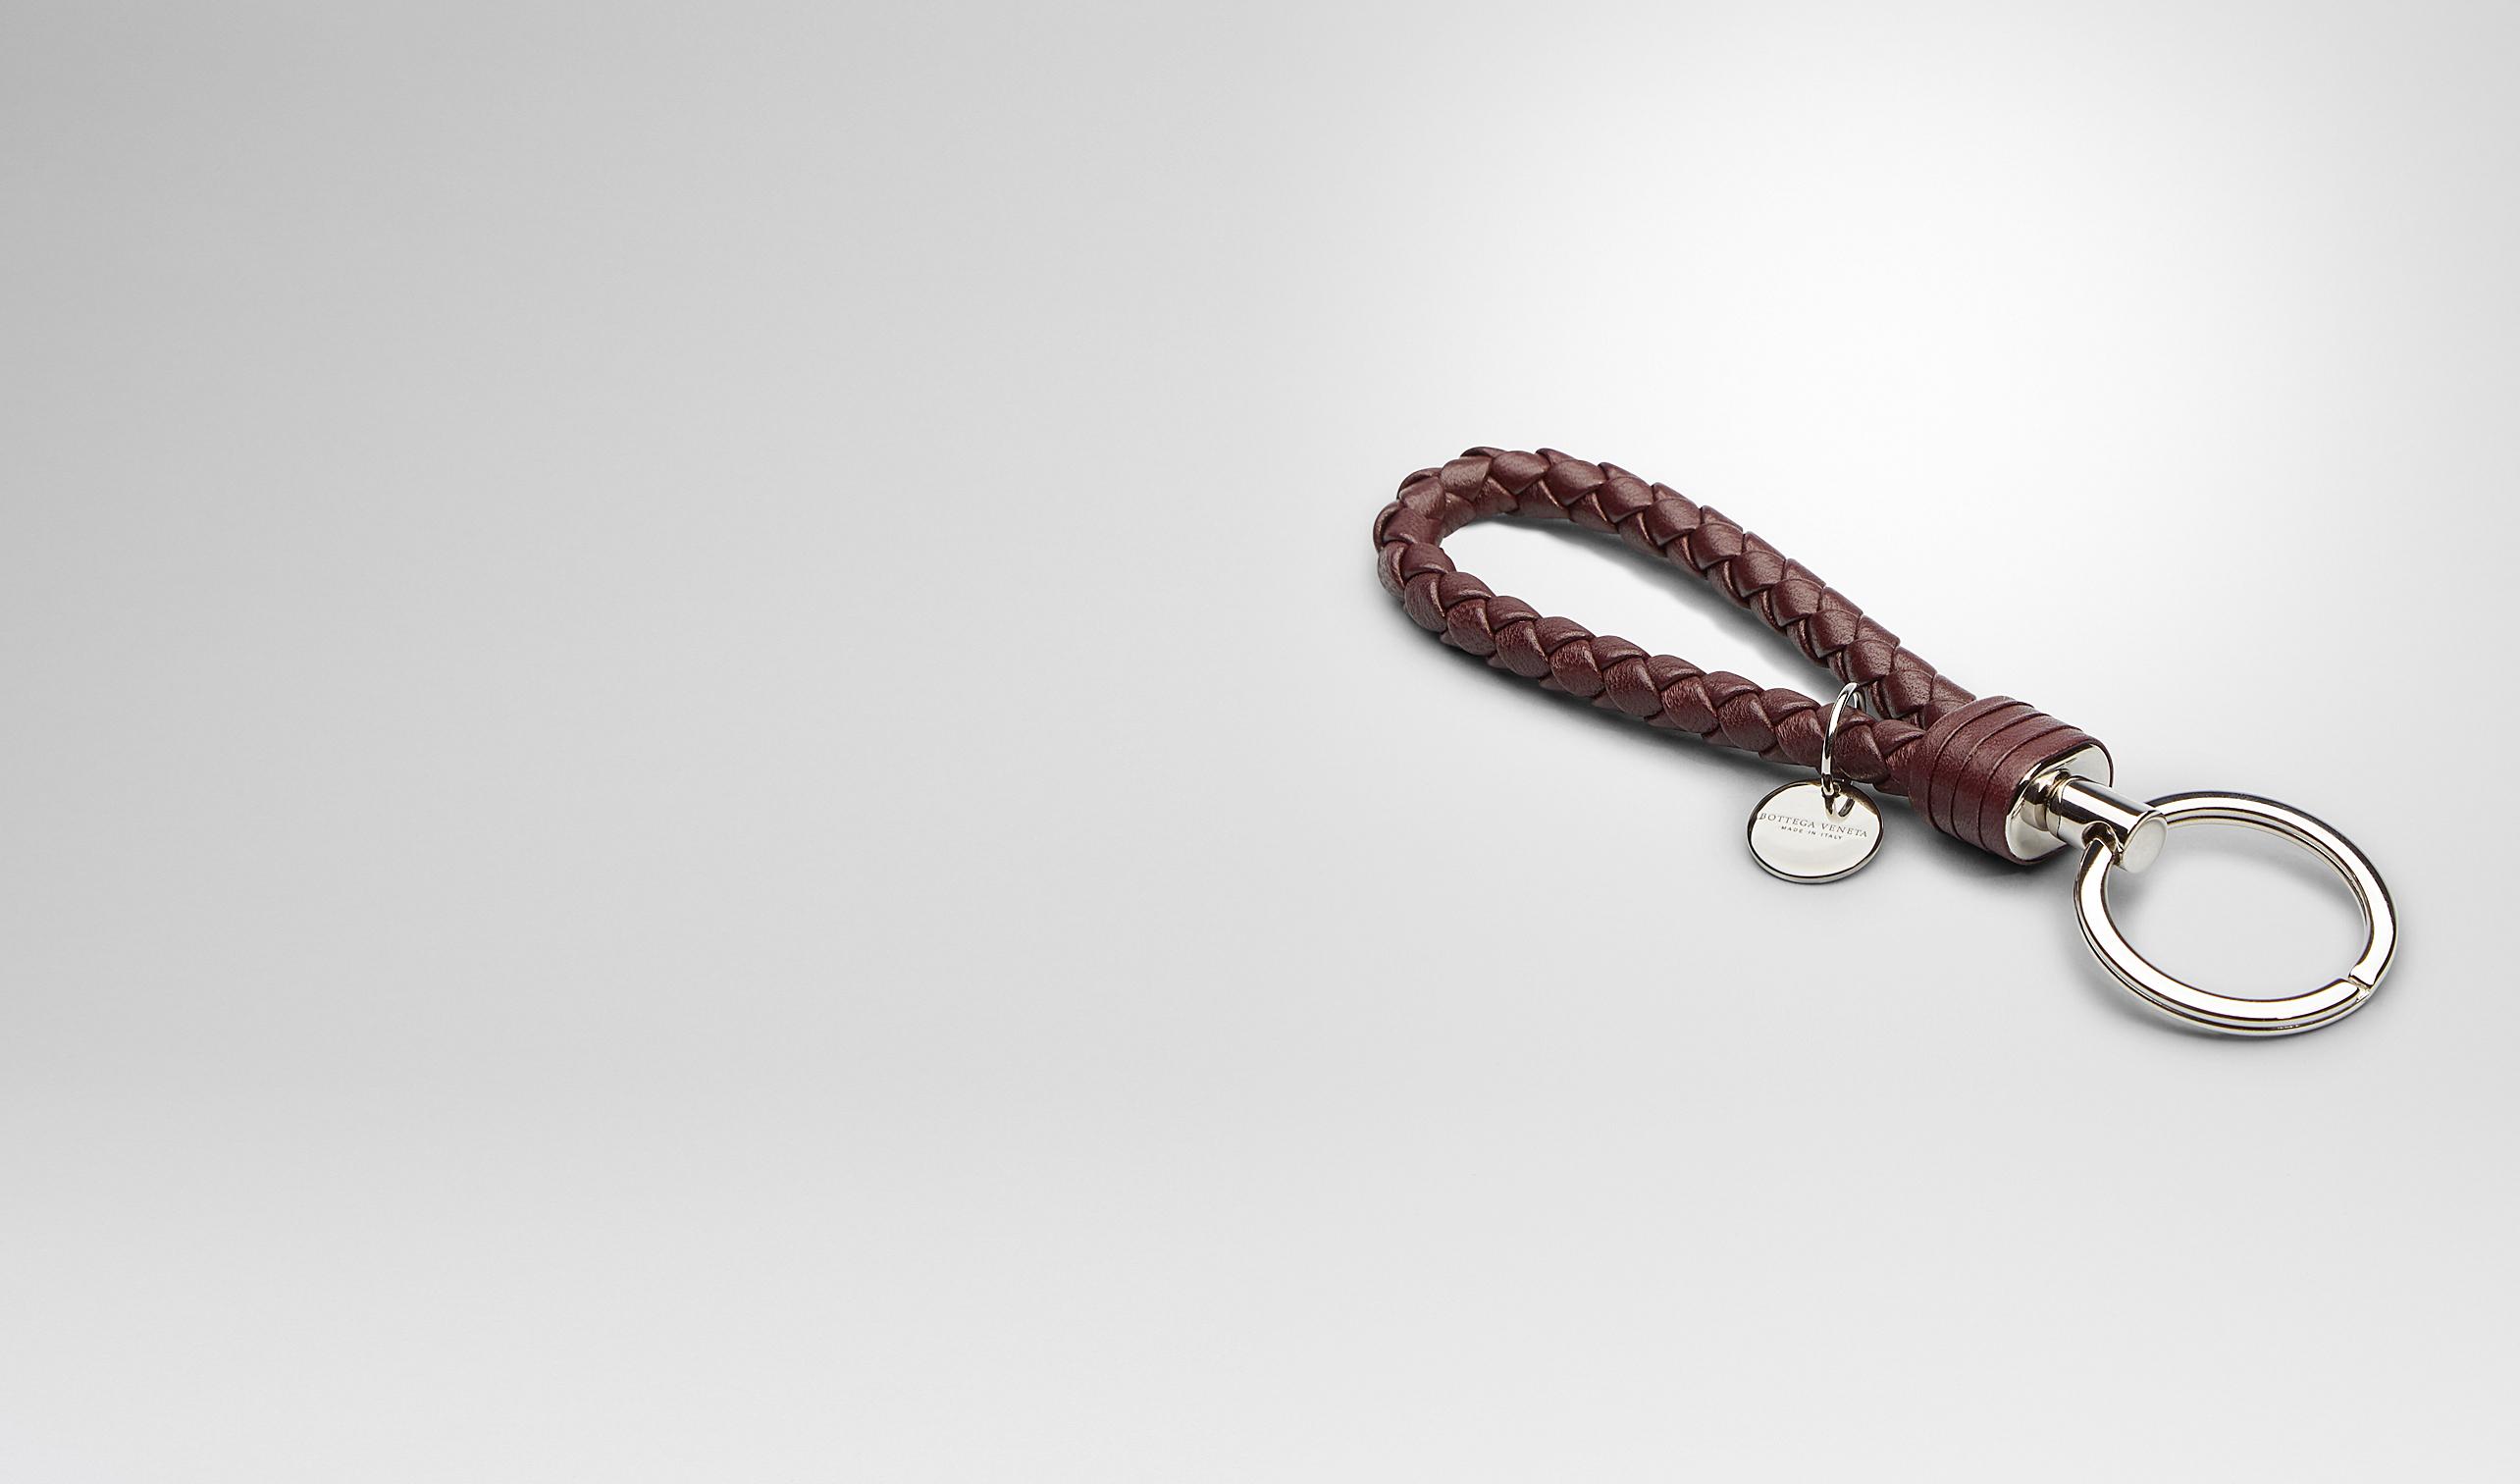 BOTTEGA VENETA Keyring or Bracelets E AUBERGINE INTRECCIATO NAPPA KEY RING pl